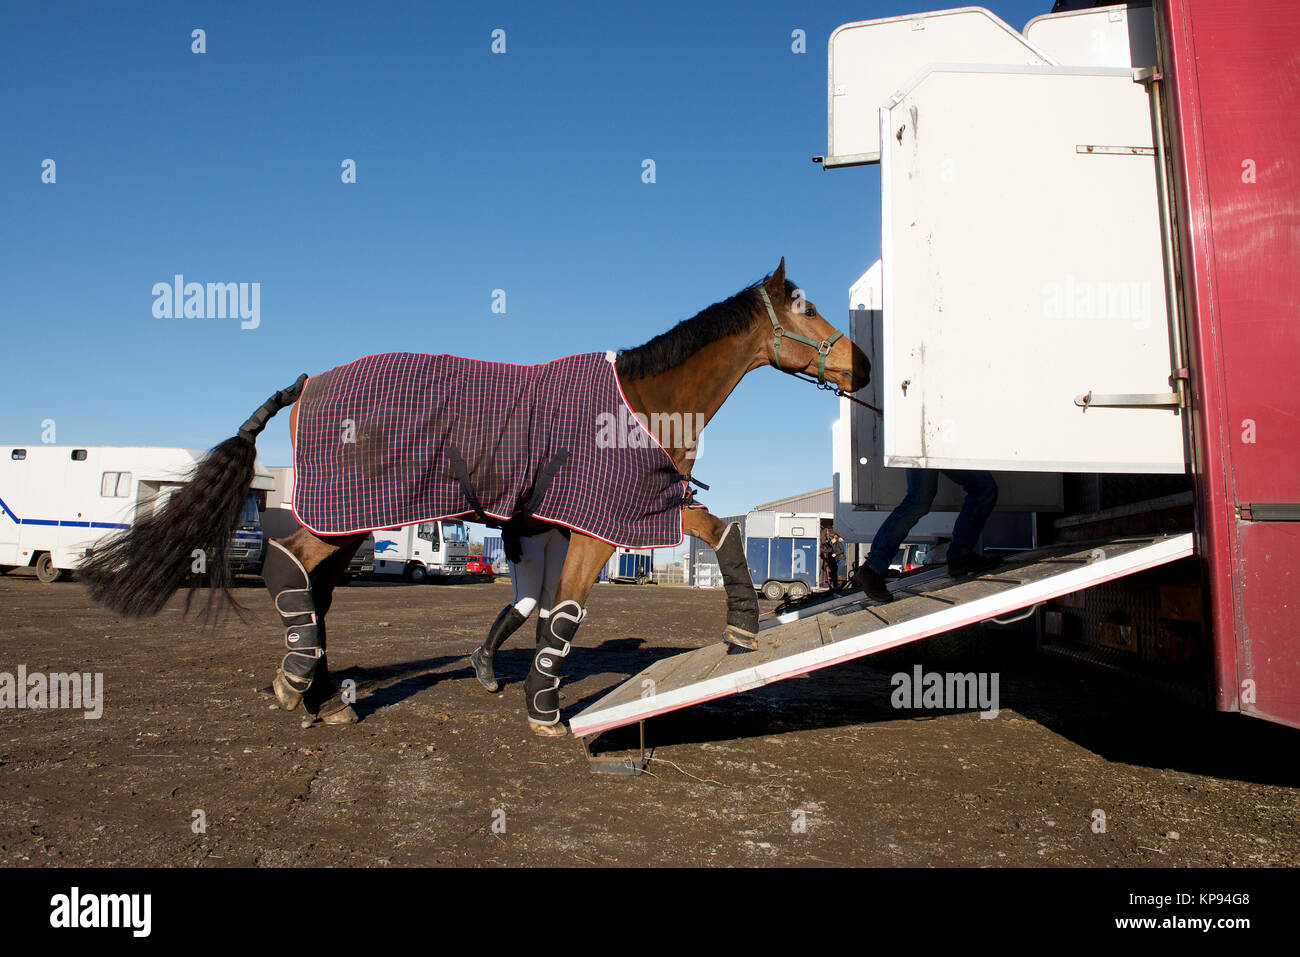 CUSTOM HORSE BOX STYLE 2 HORSE BOX TRAILER CAR BUMPER STICKER EQUESTRIAN PONY